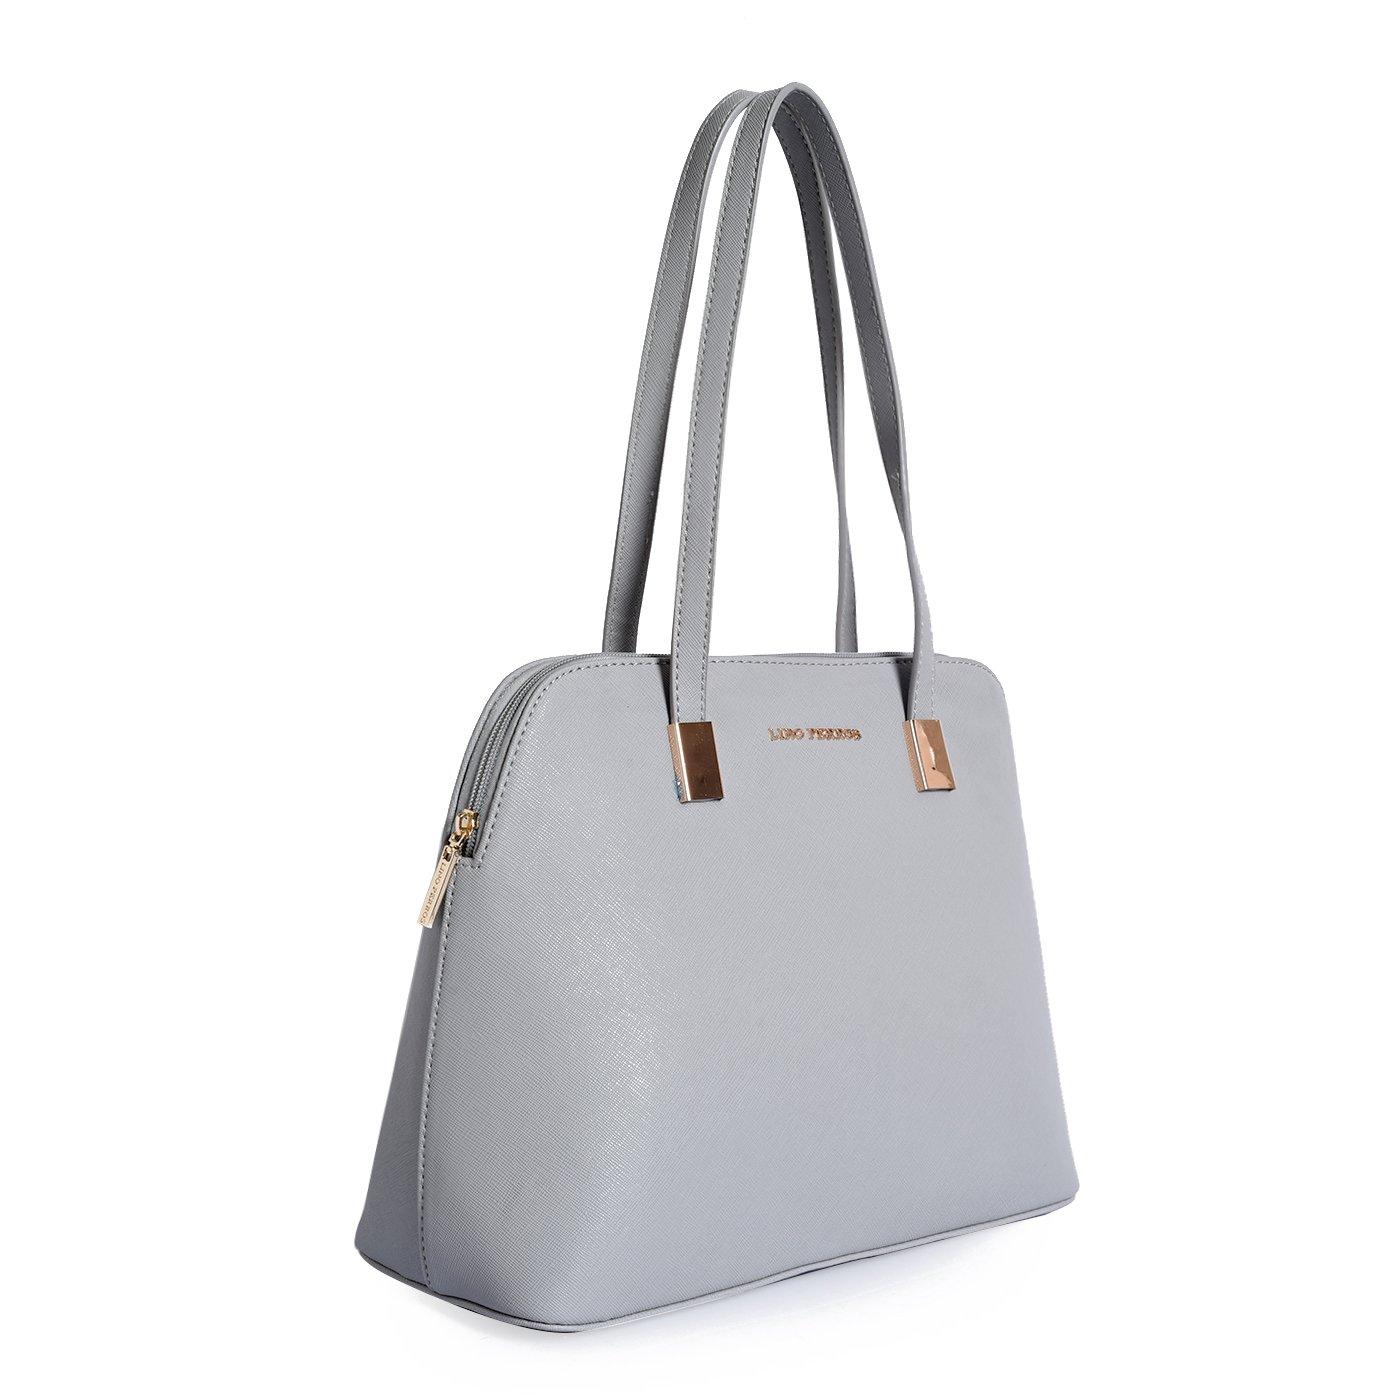 Lino Perro's Handbags For Women